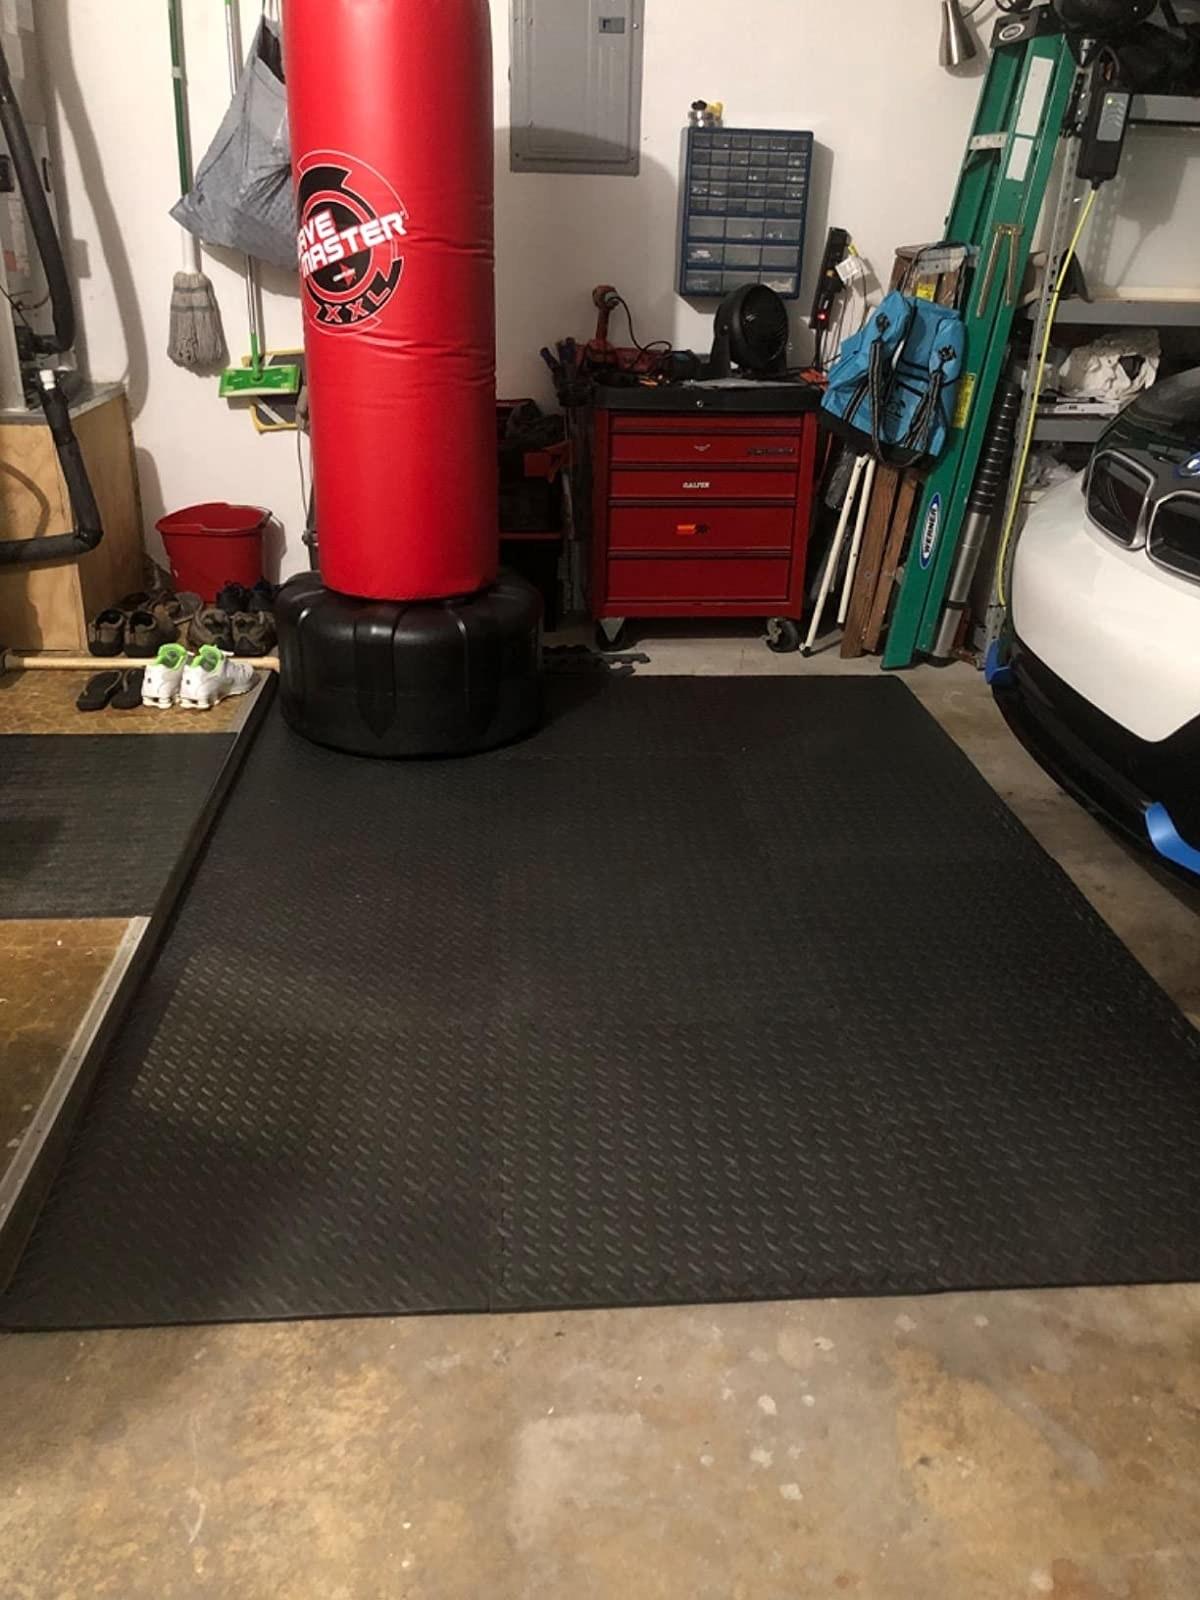 black interlocking exercise mat on garage floor